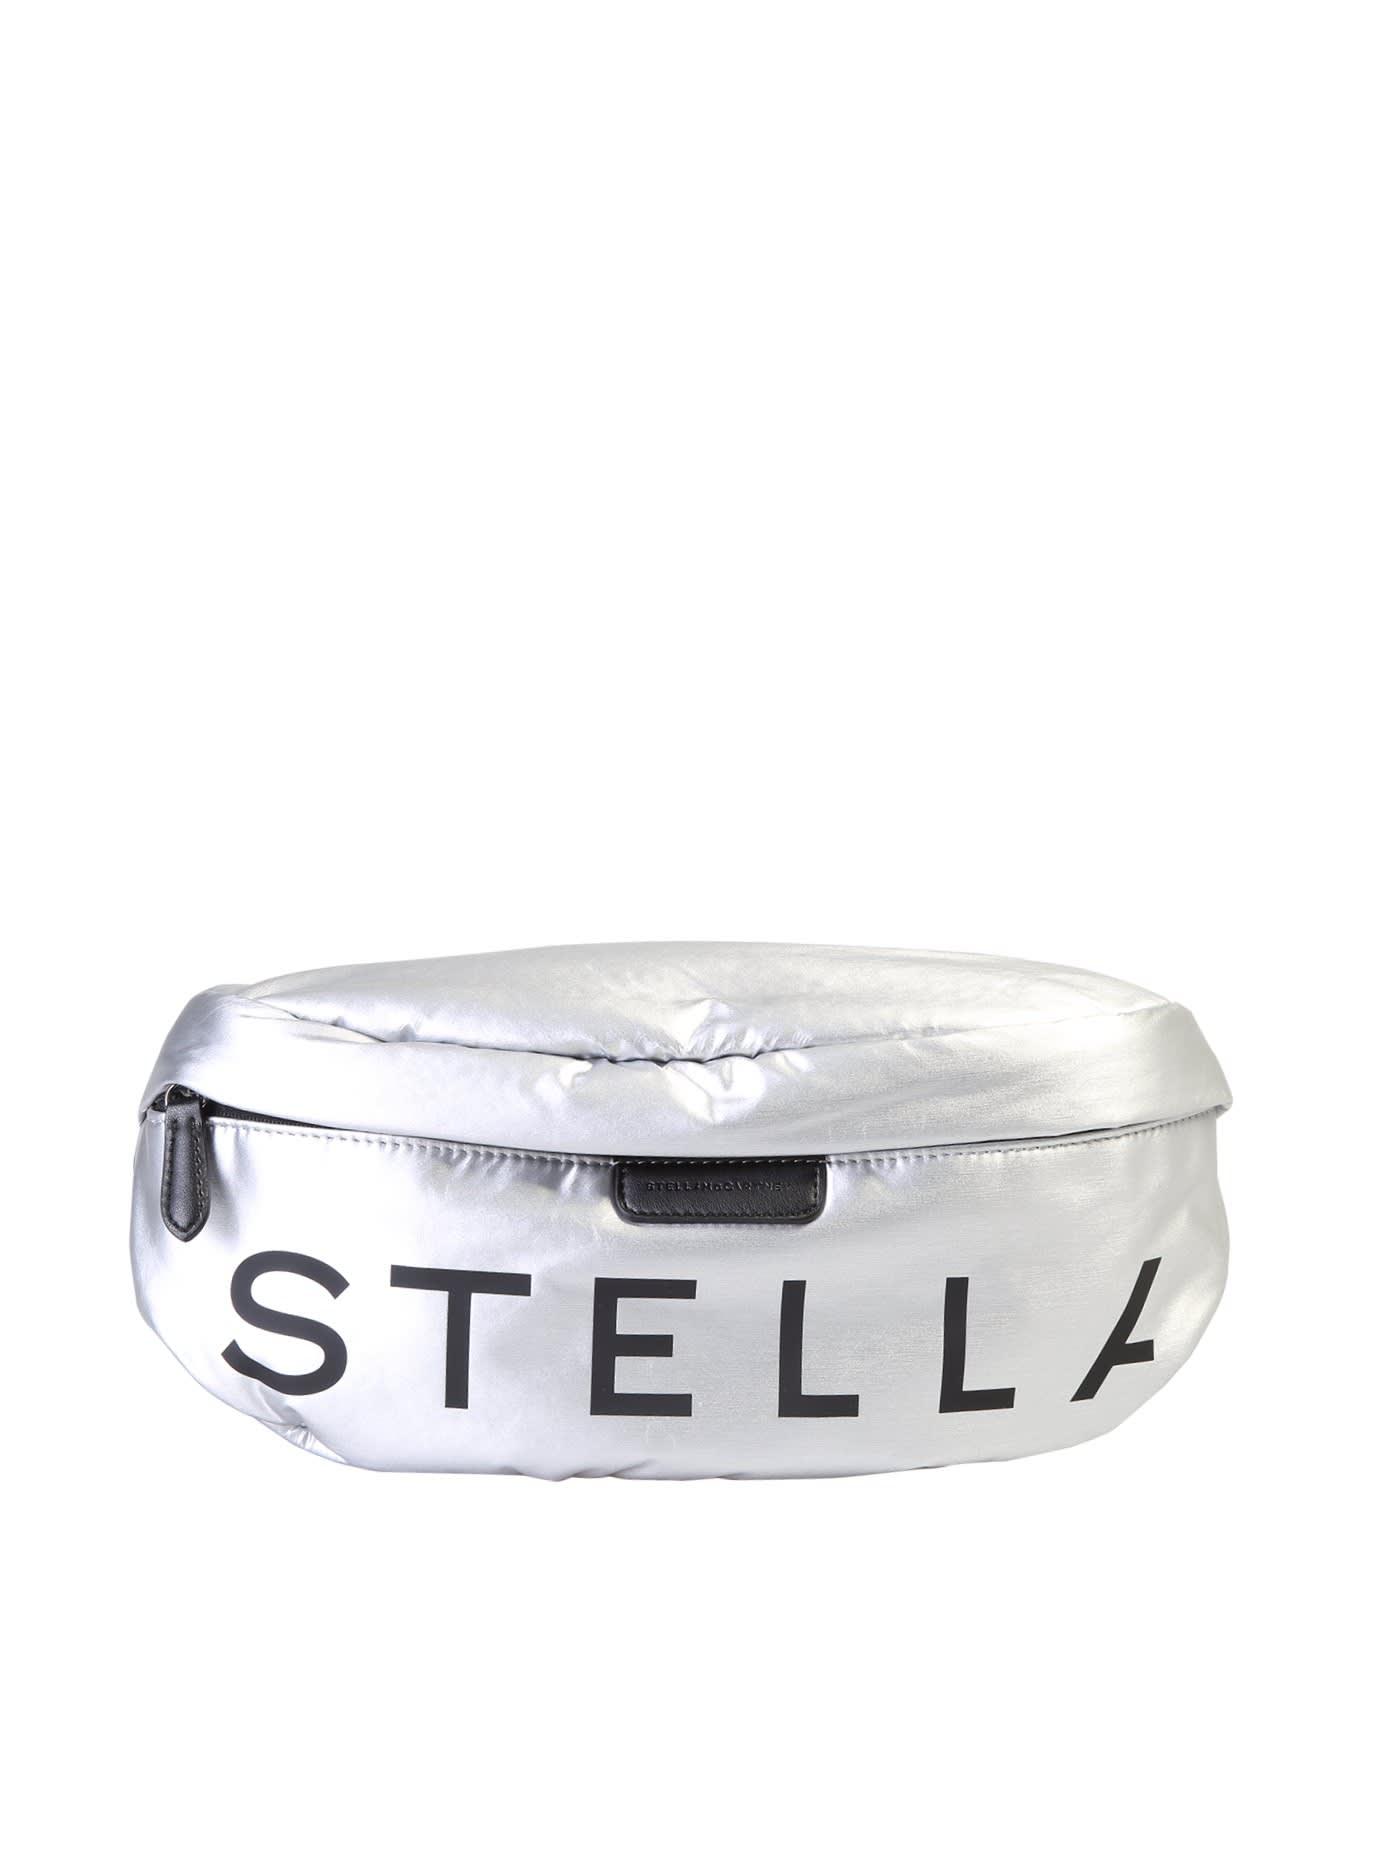 Stella McCartney Falabella Bum Bag